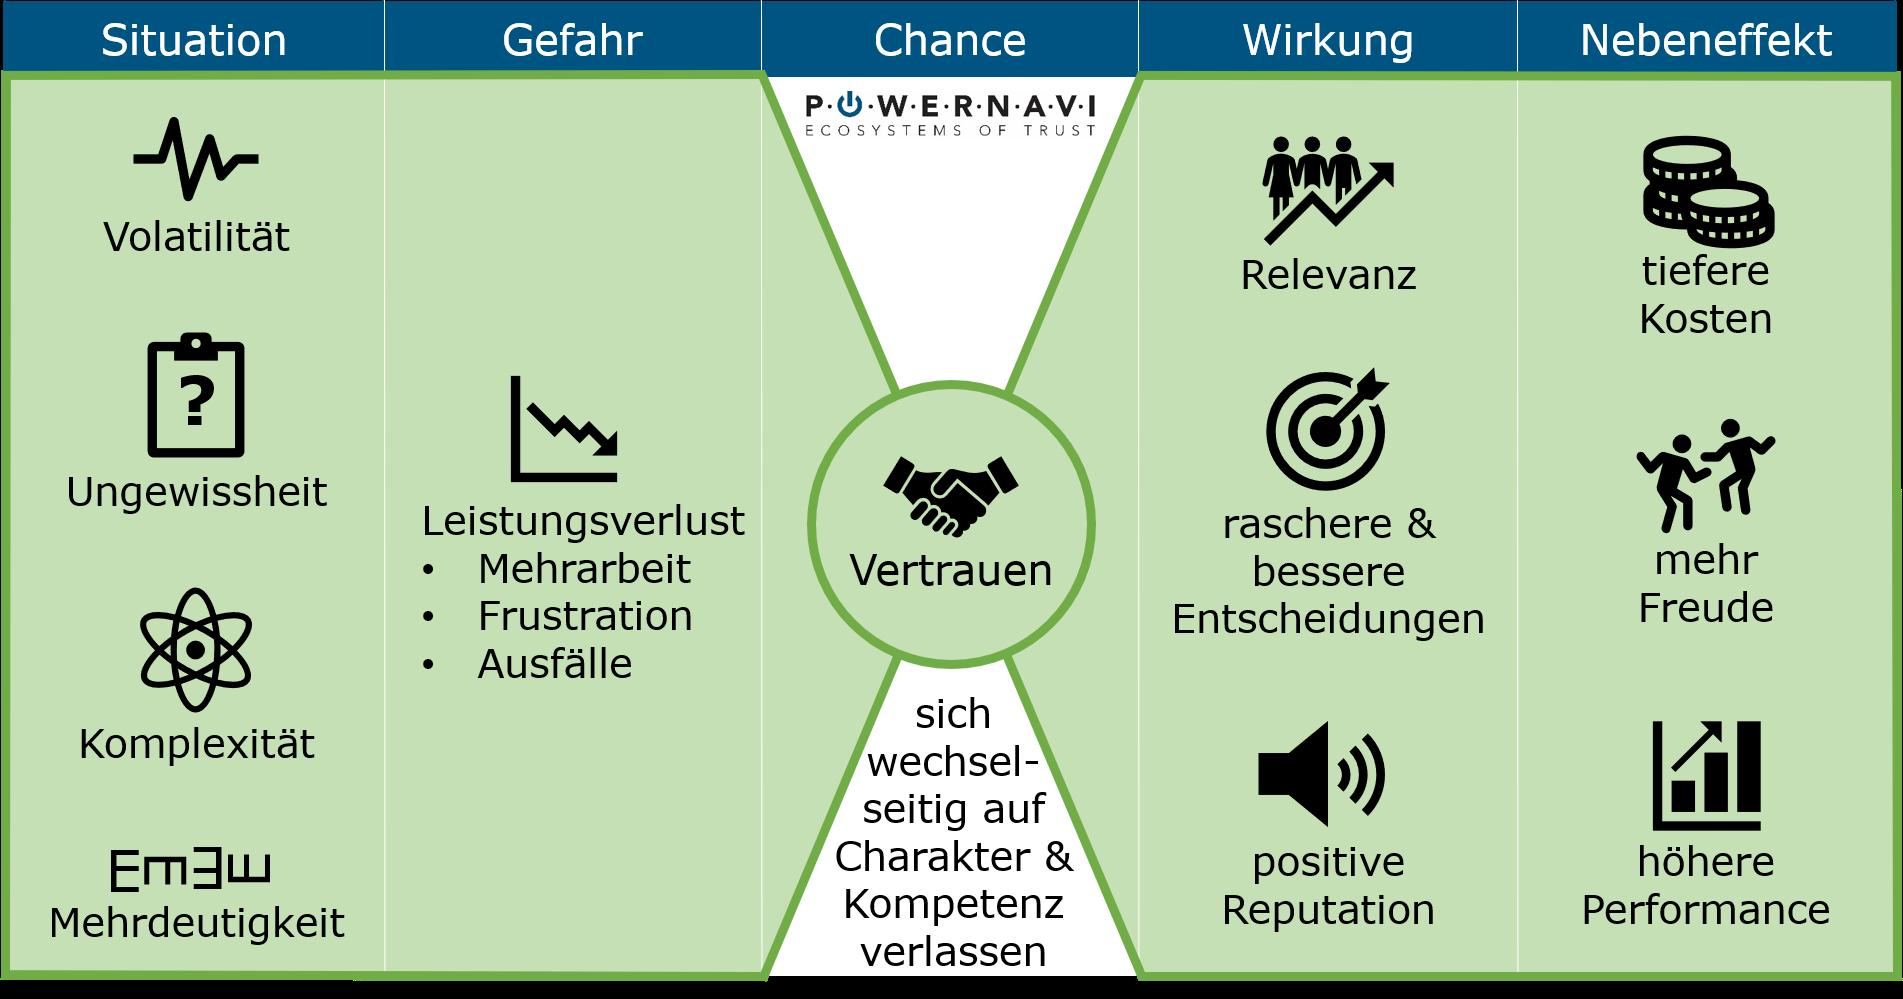 Influencer Vertrauen powernavi.ch